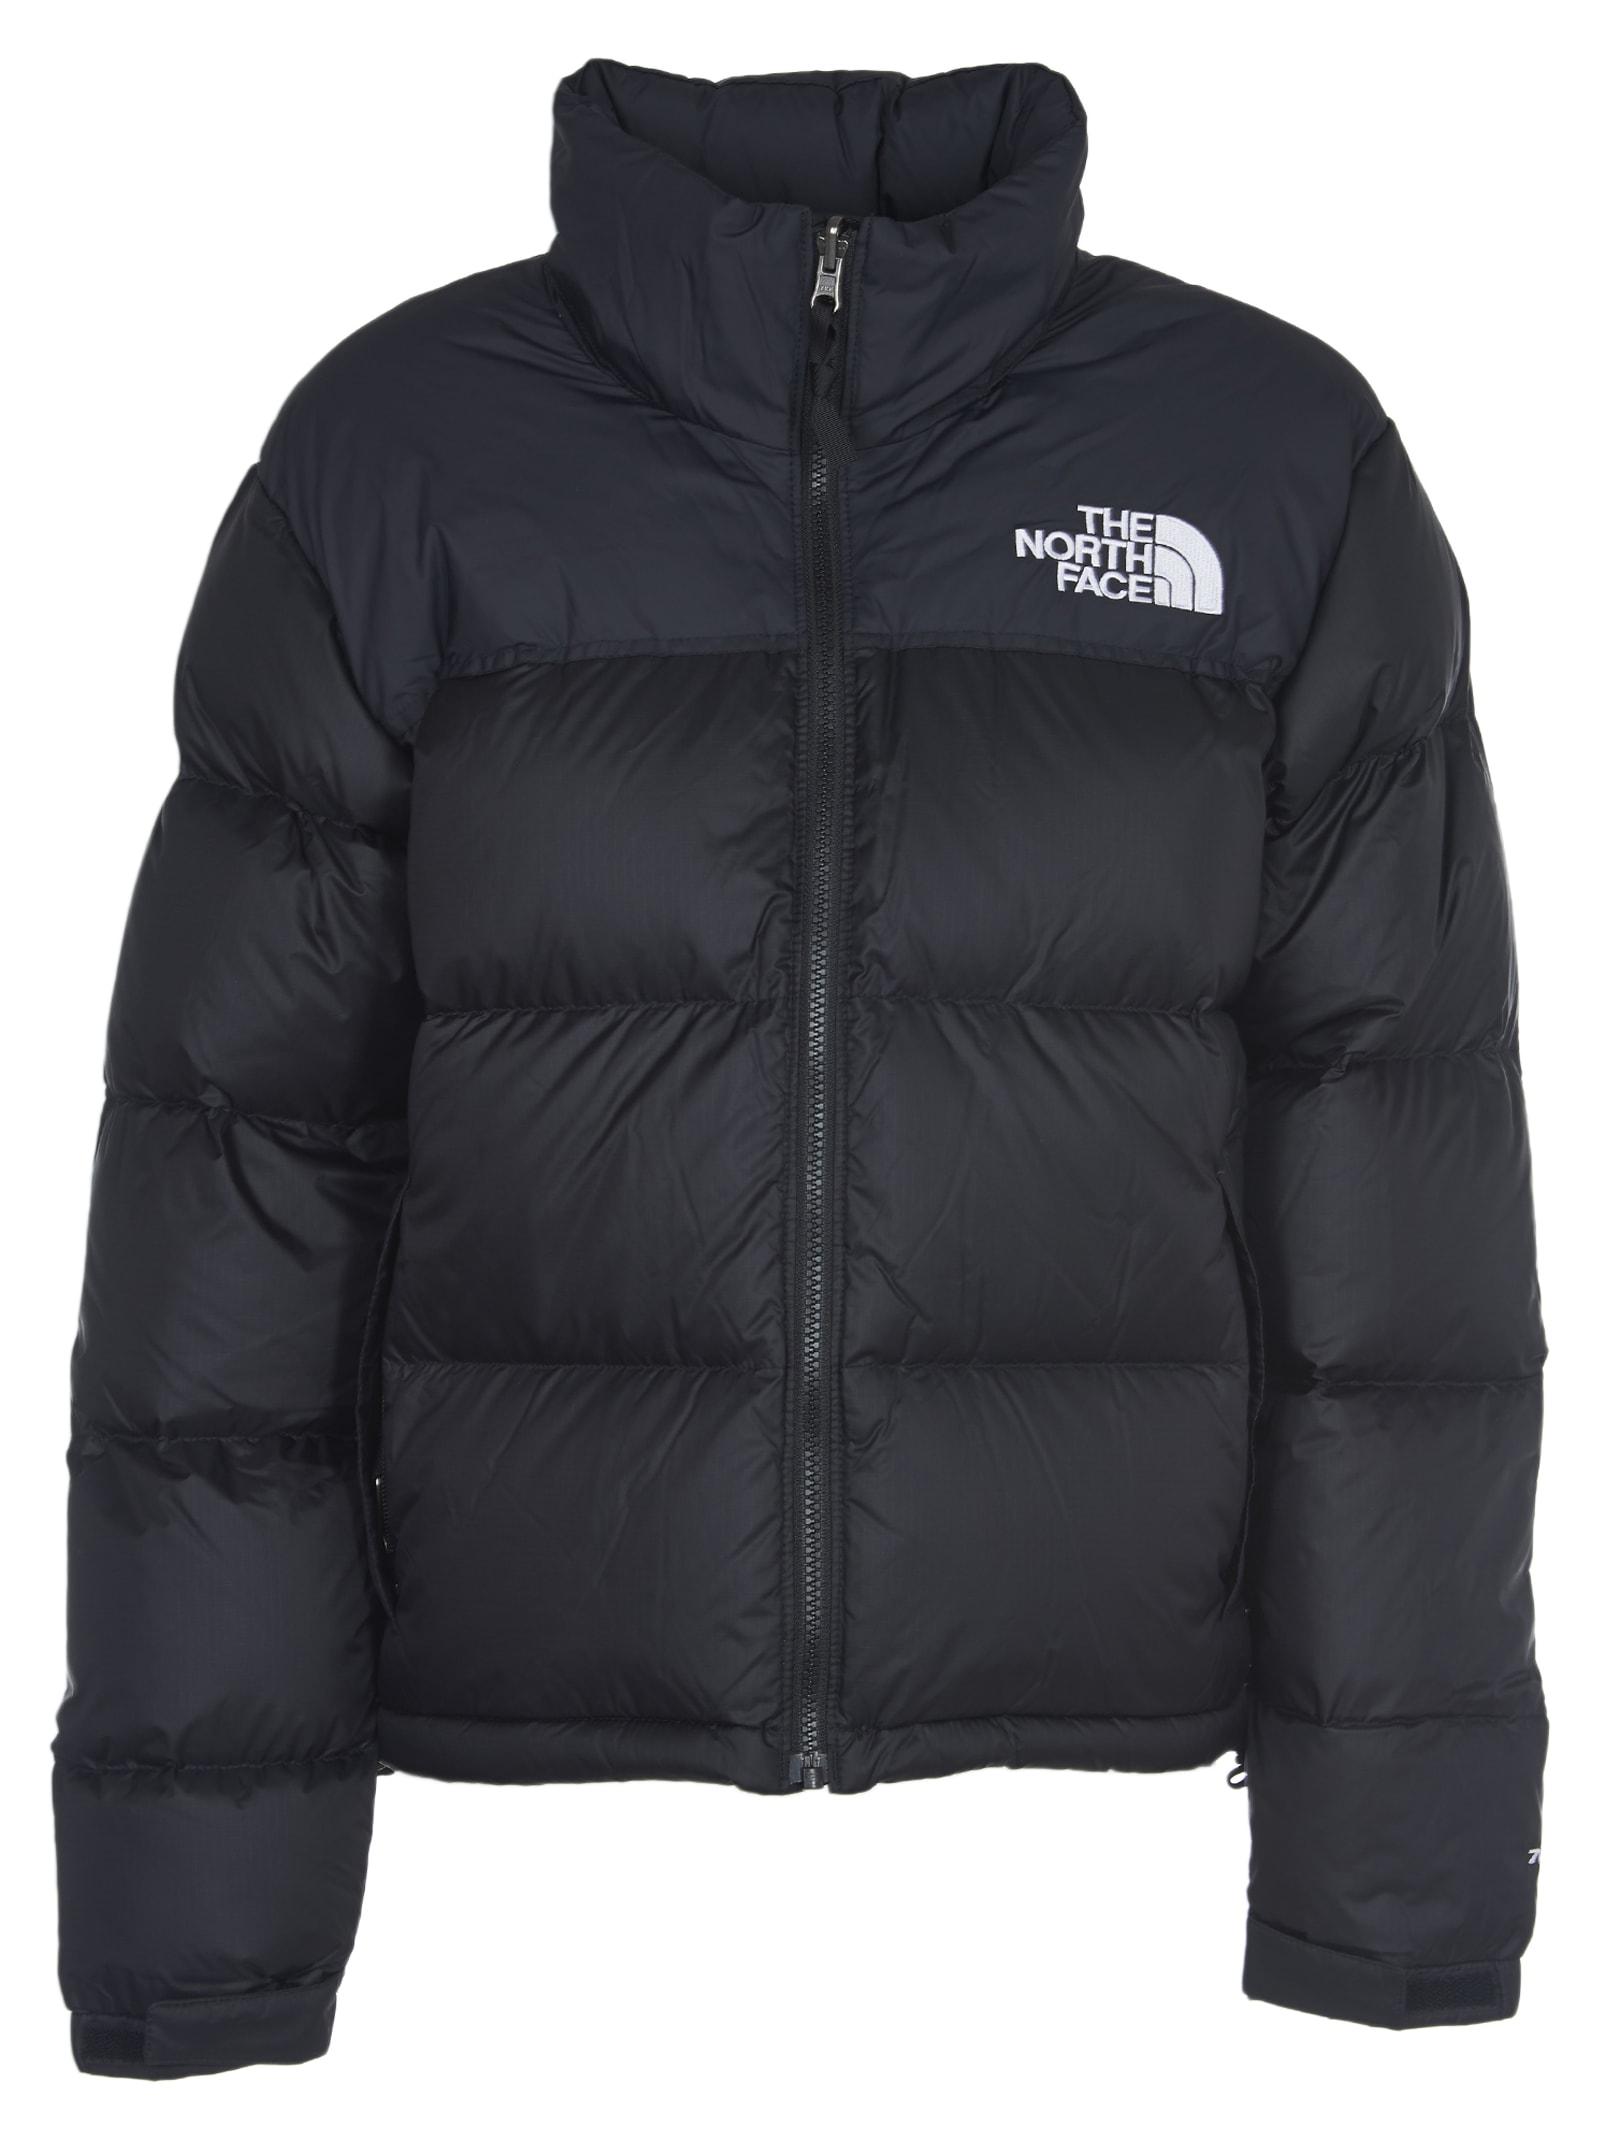 The North Face Nuptse 1996 Black Jacket